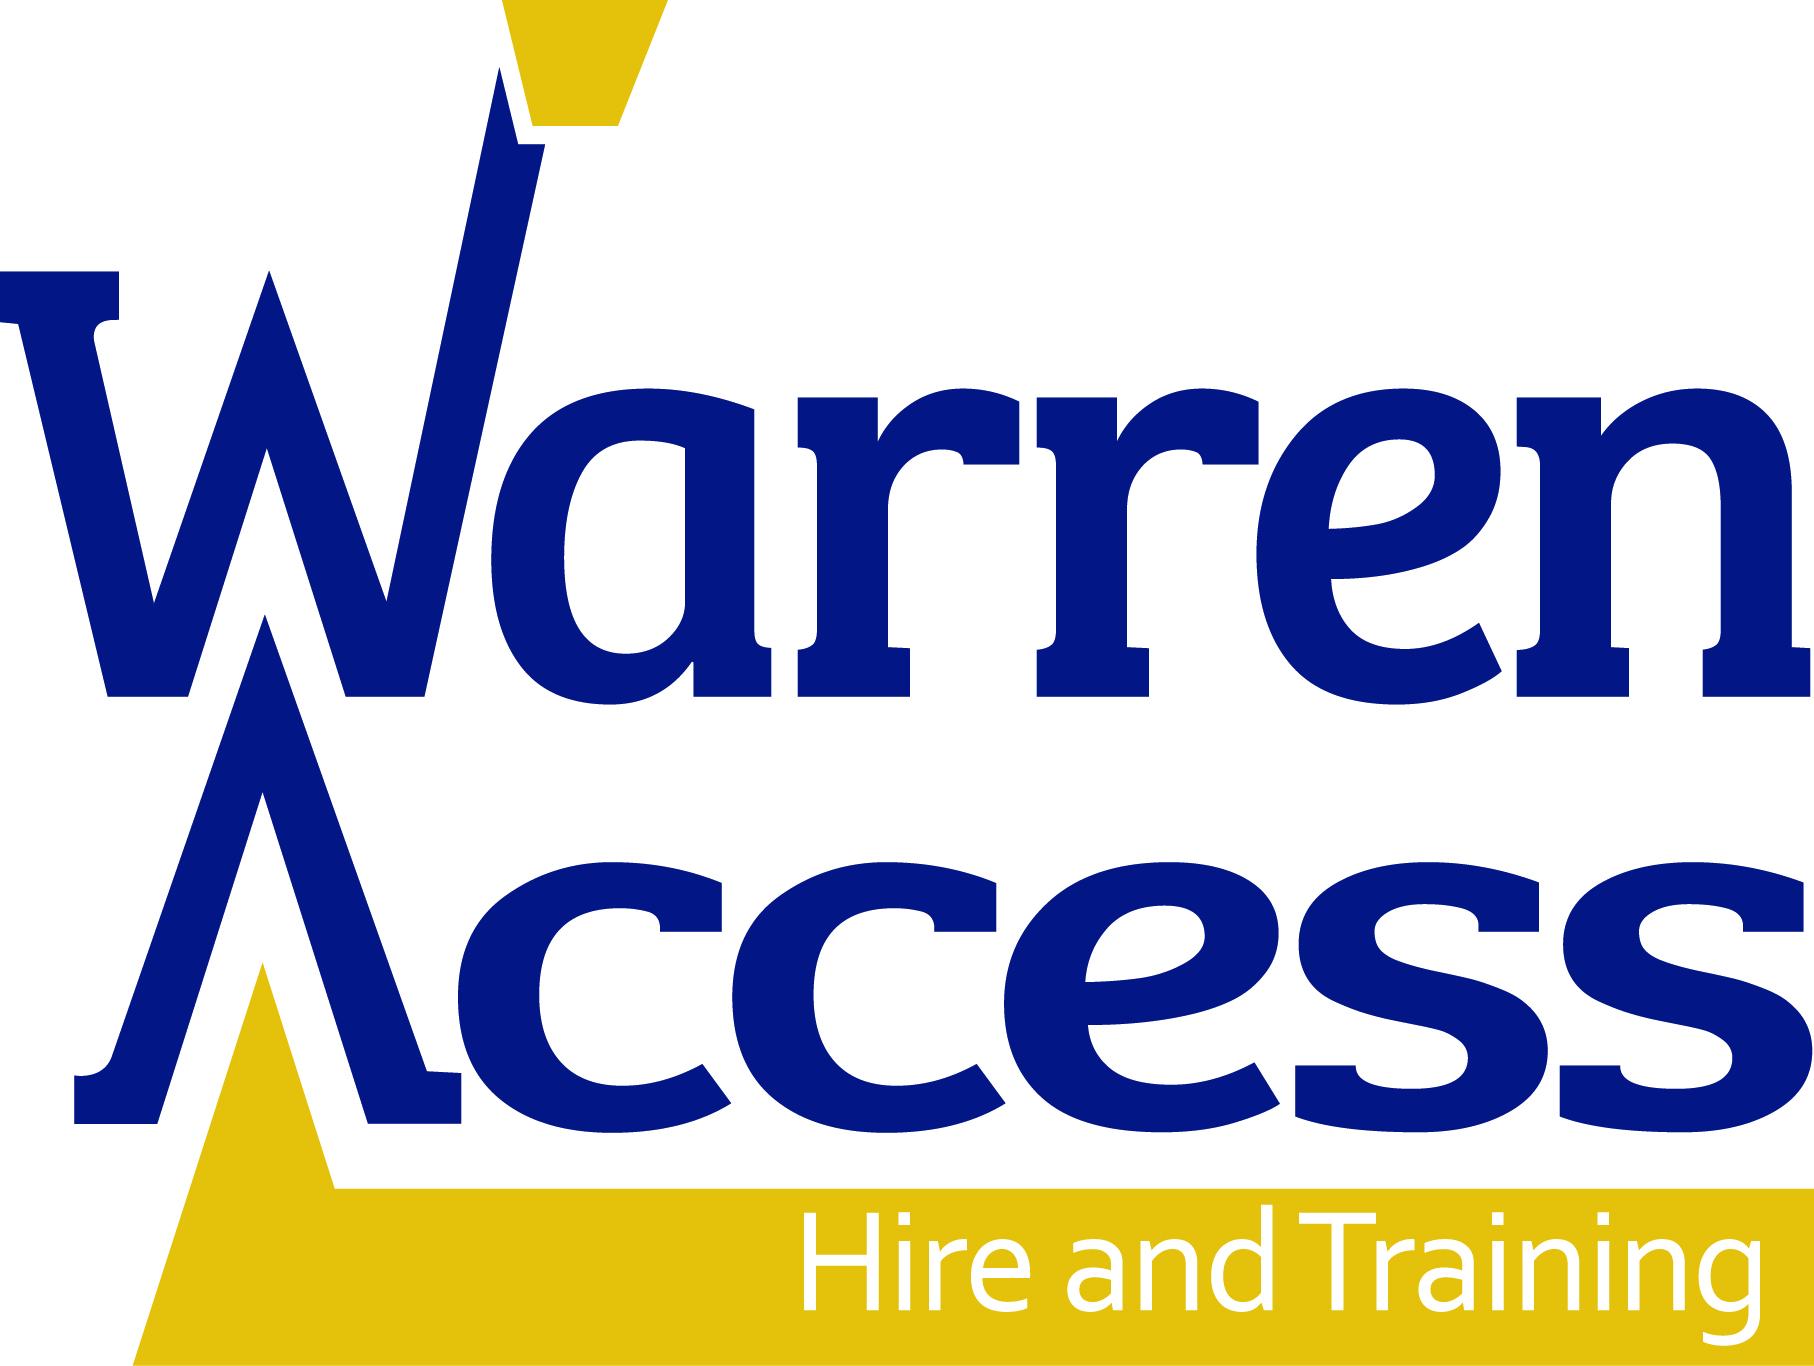 DIRECTORY-LISTING-training-warren-access-3